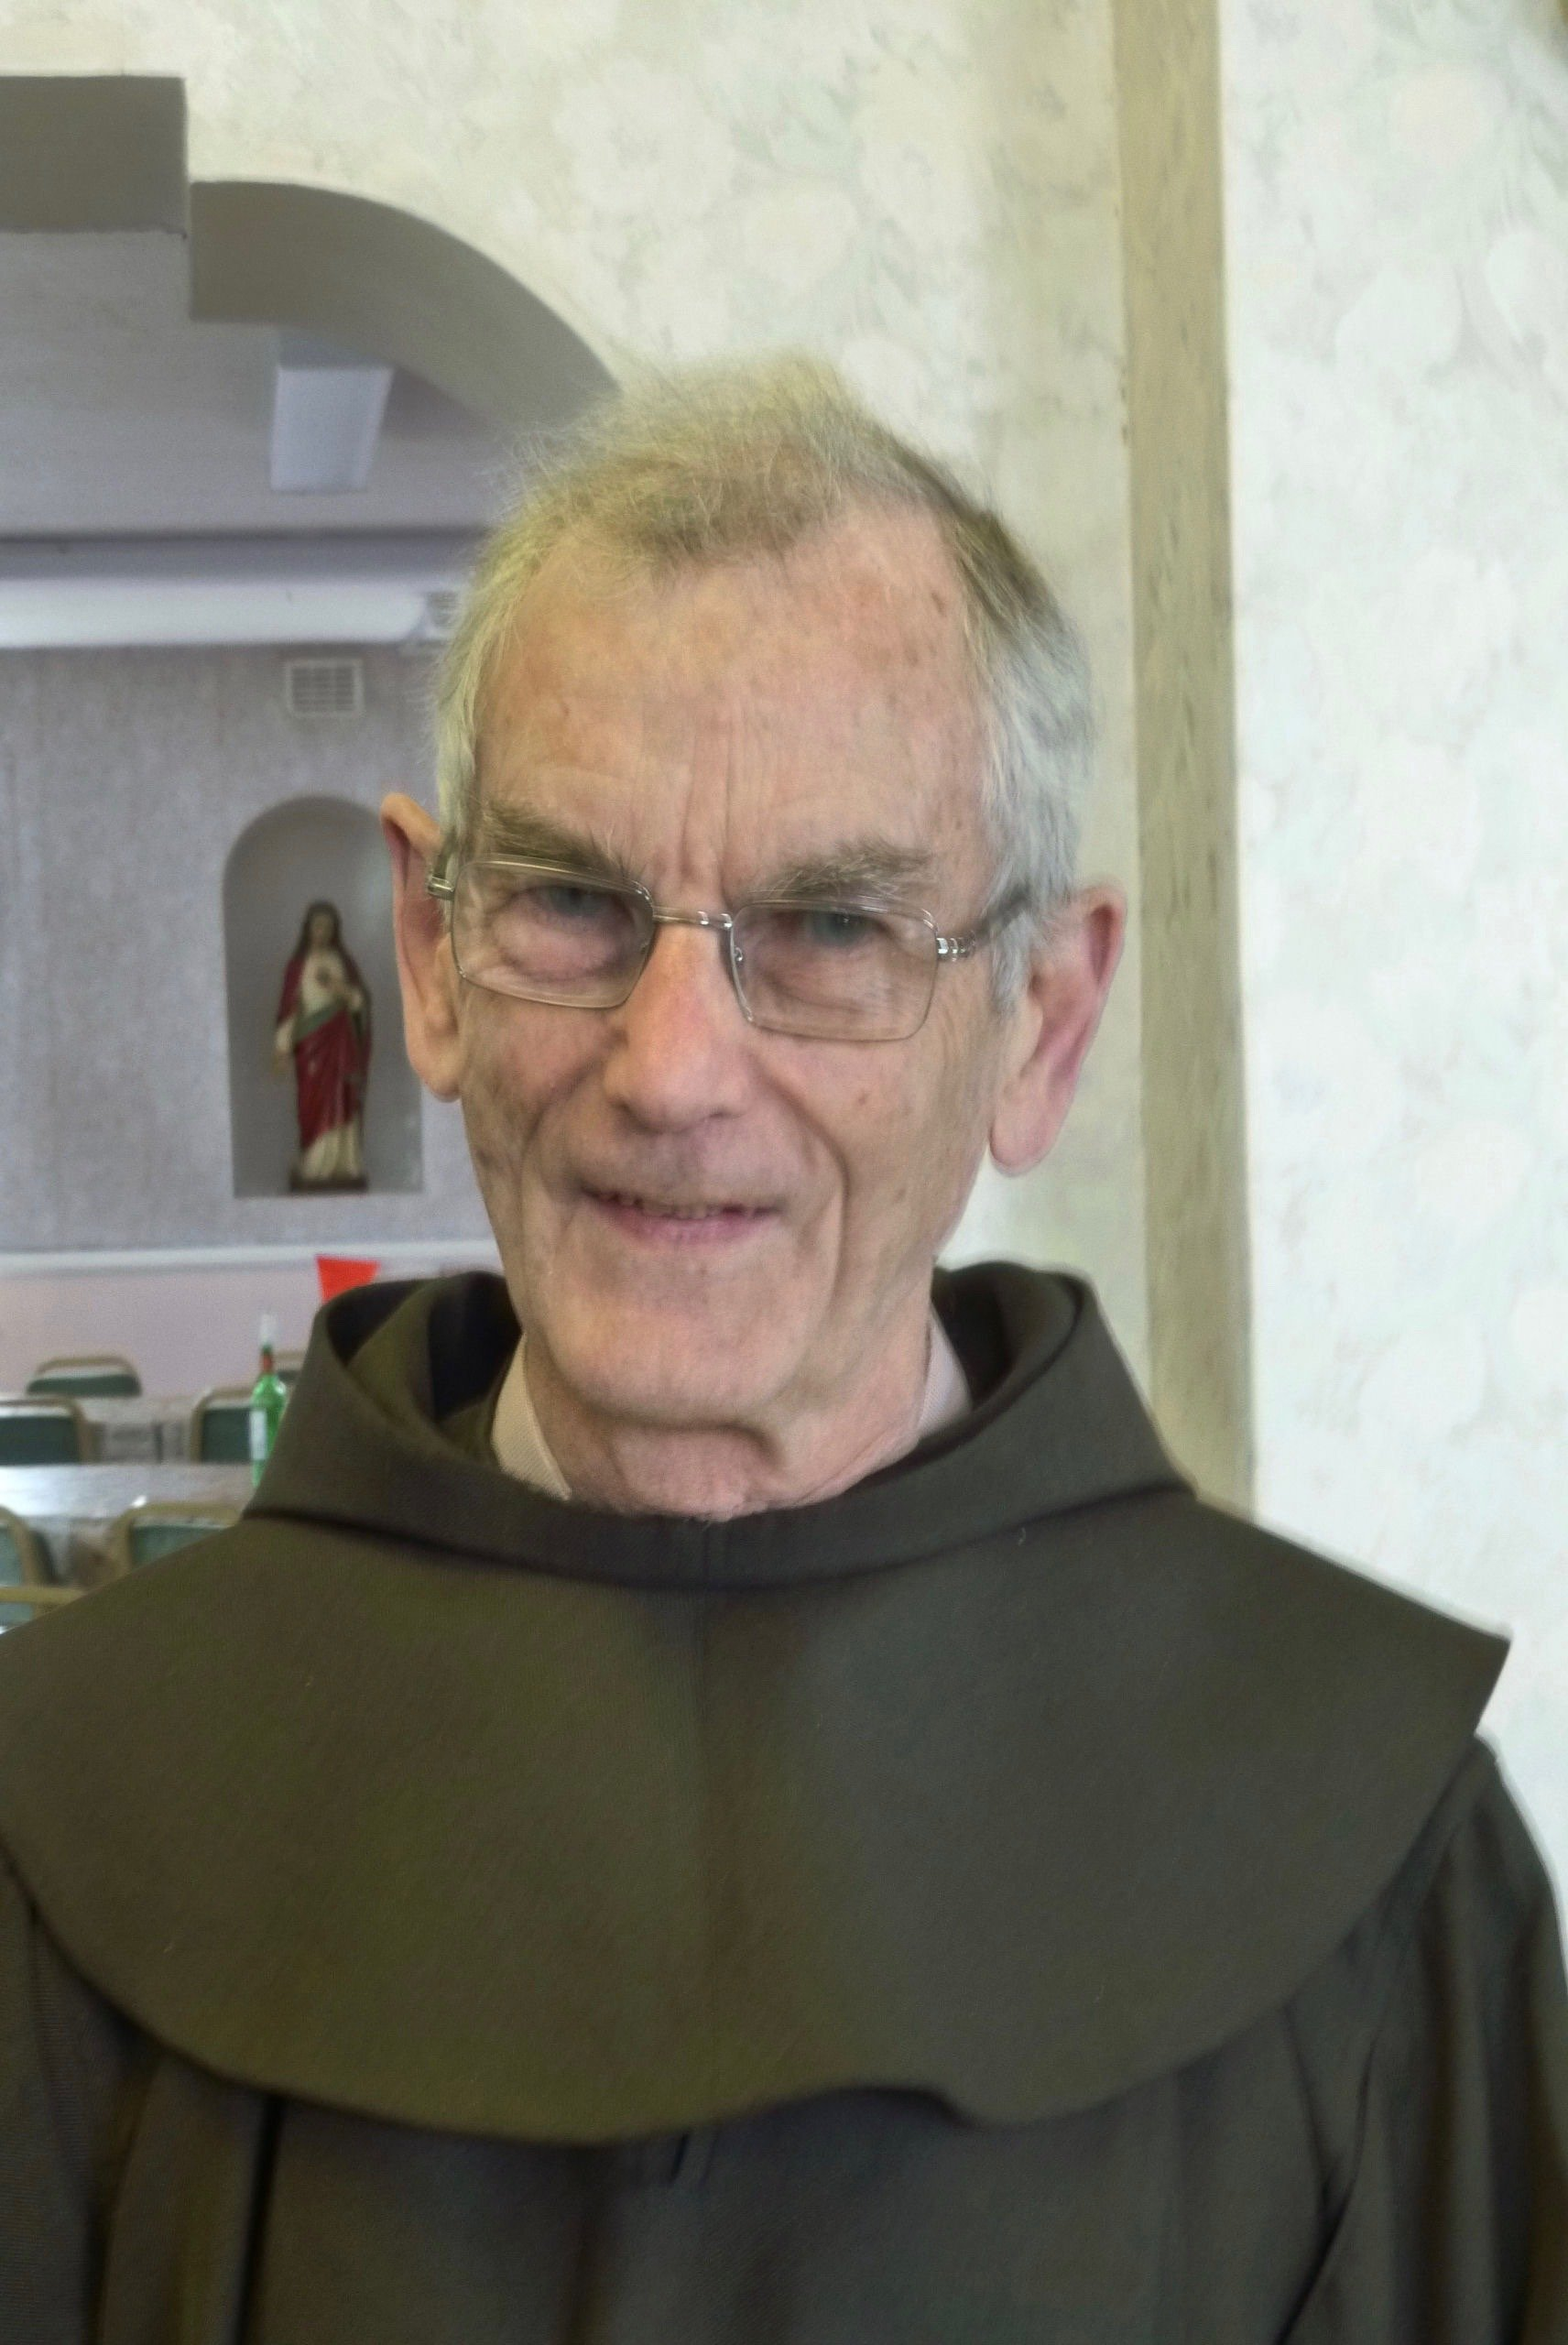 Quentin Jackson 70 years a Friar